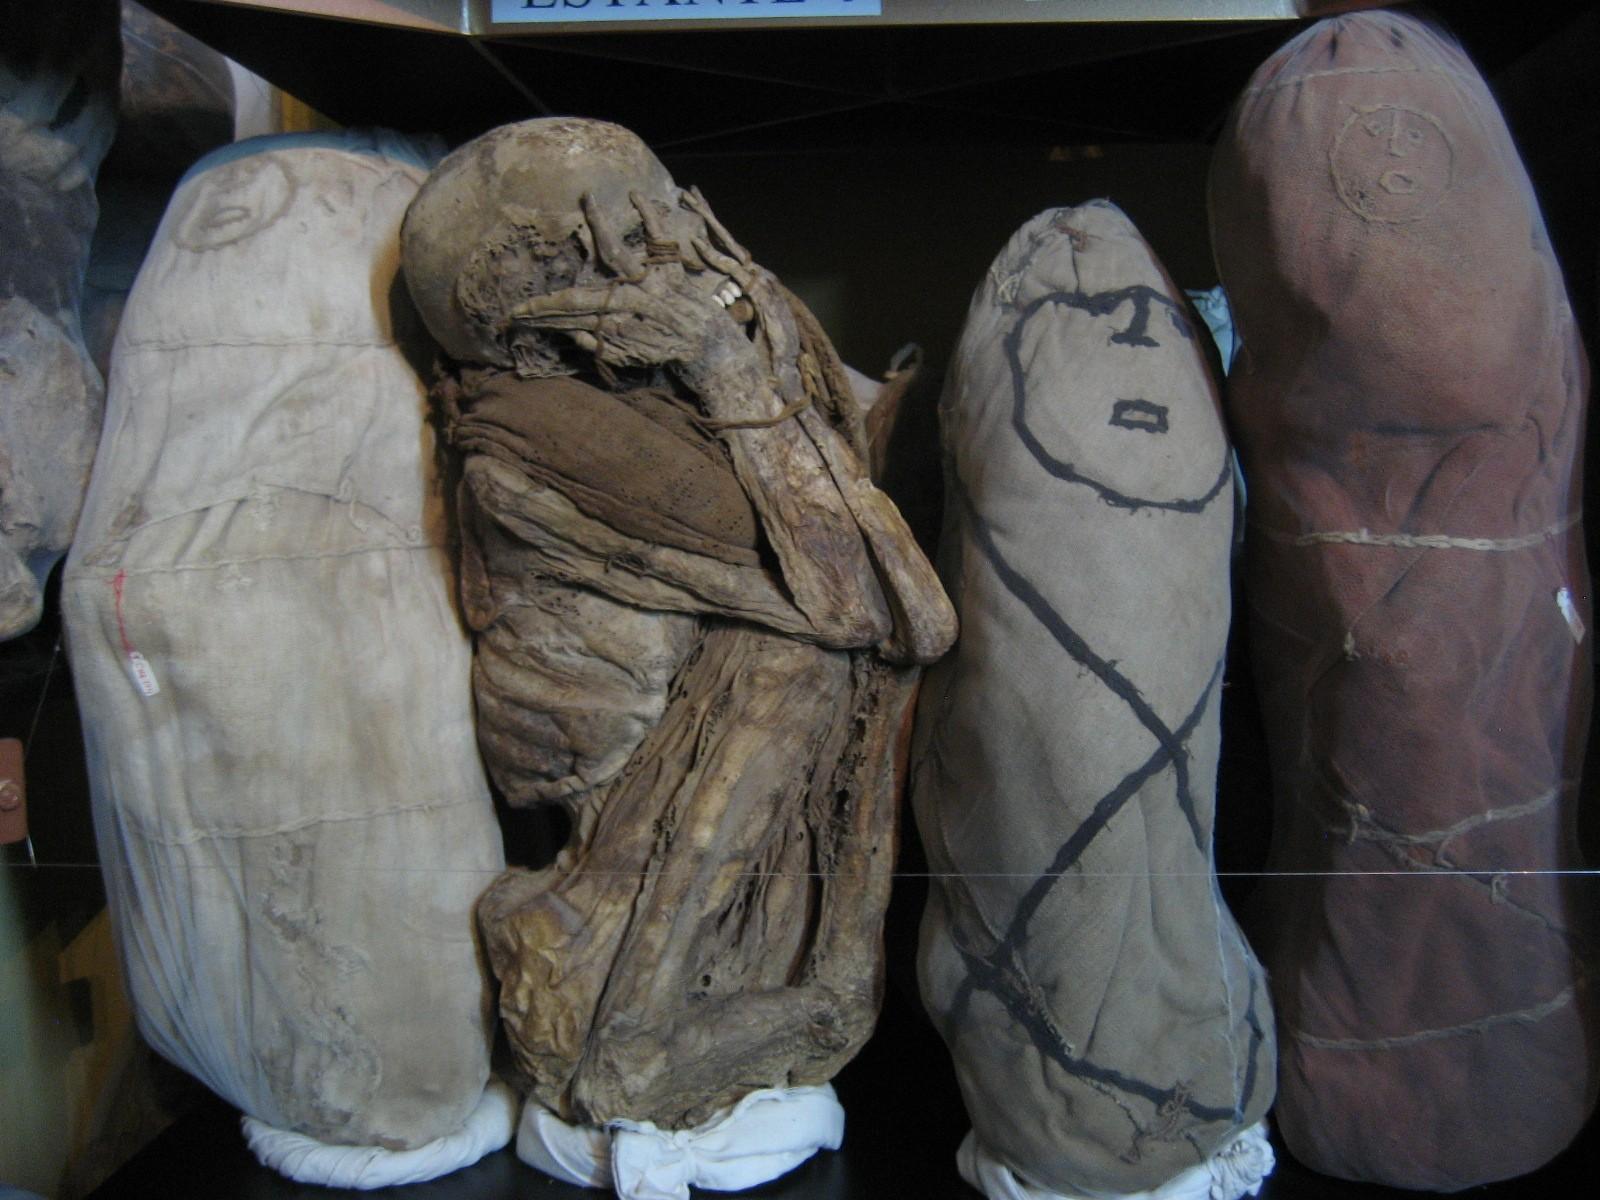 per07-visit-a-museum-of-mummies-free-im